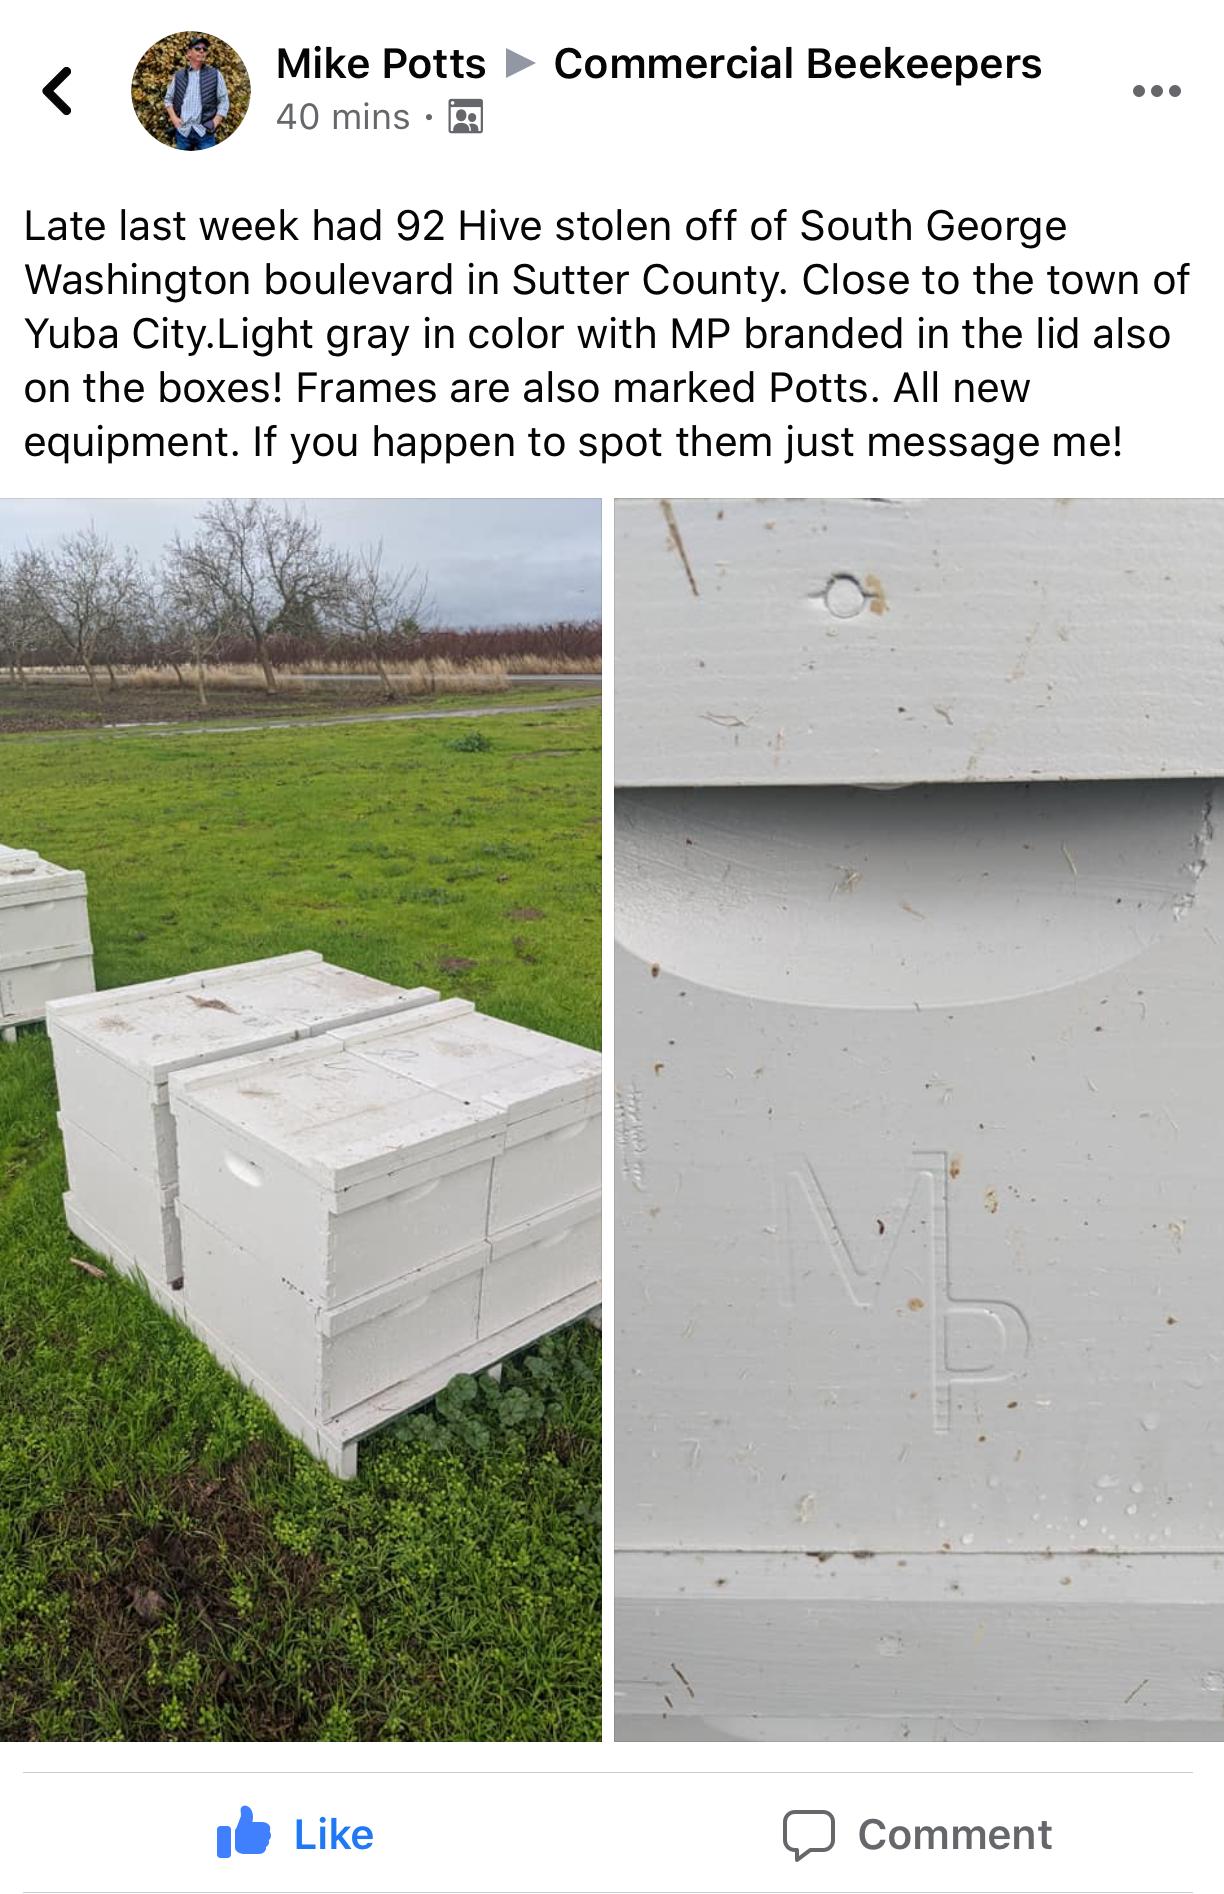 January 17, 2020 – Hive Theft Alert